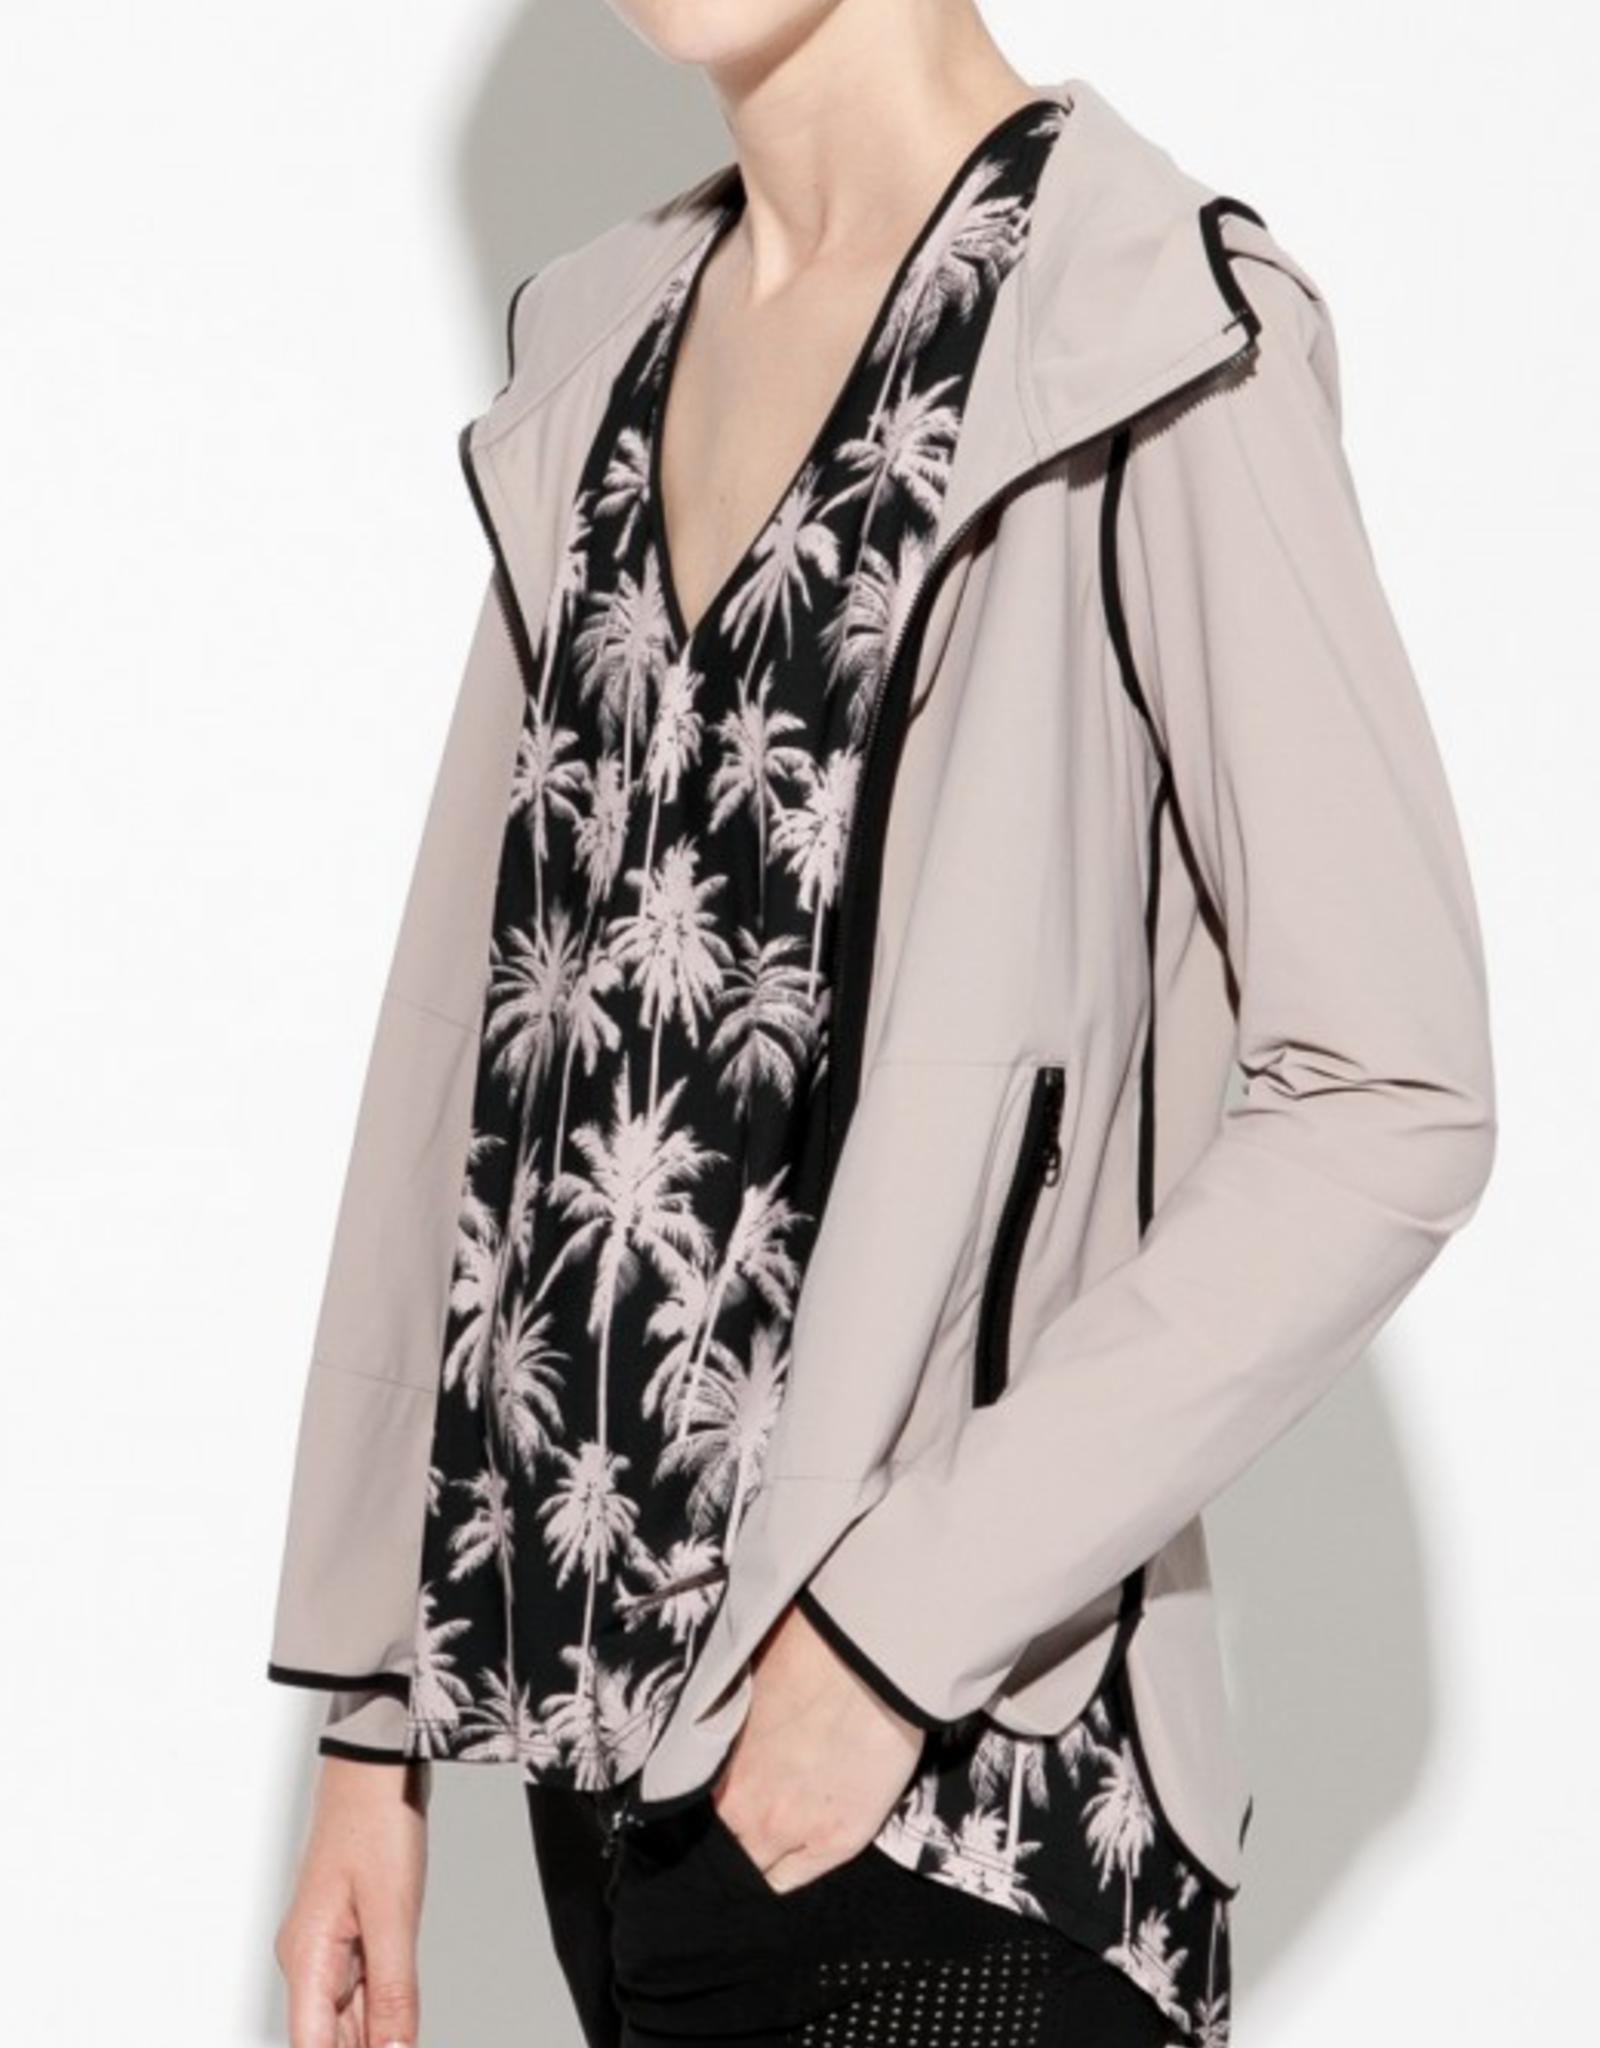 Indies Madison Blouson/Jacket